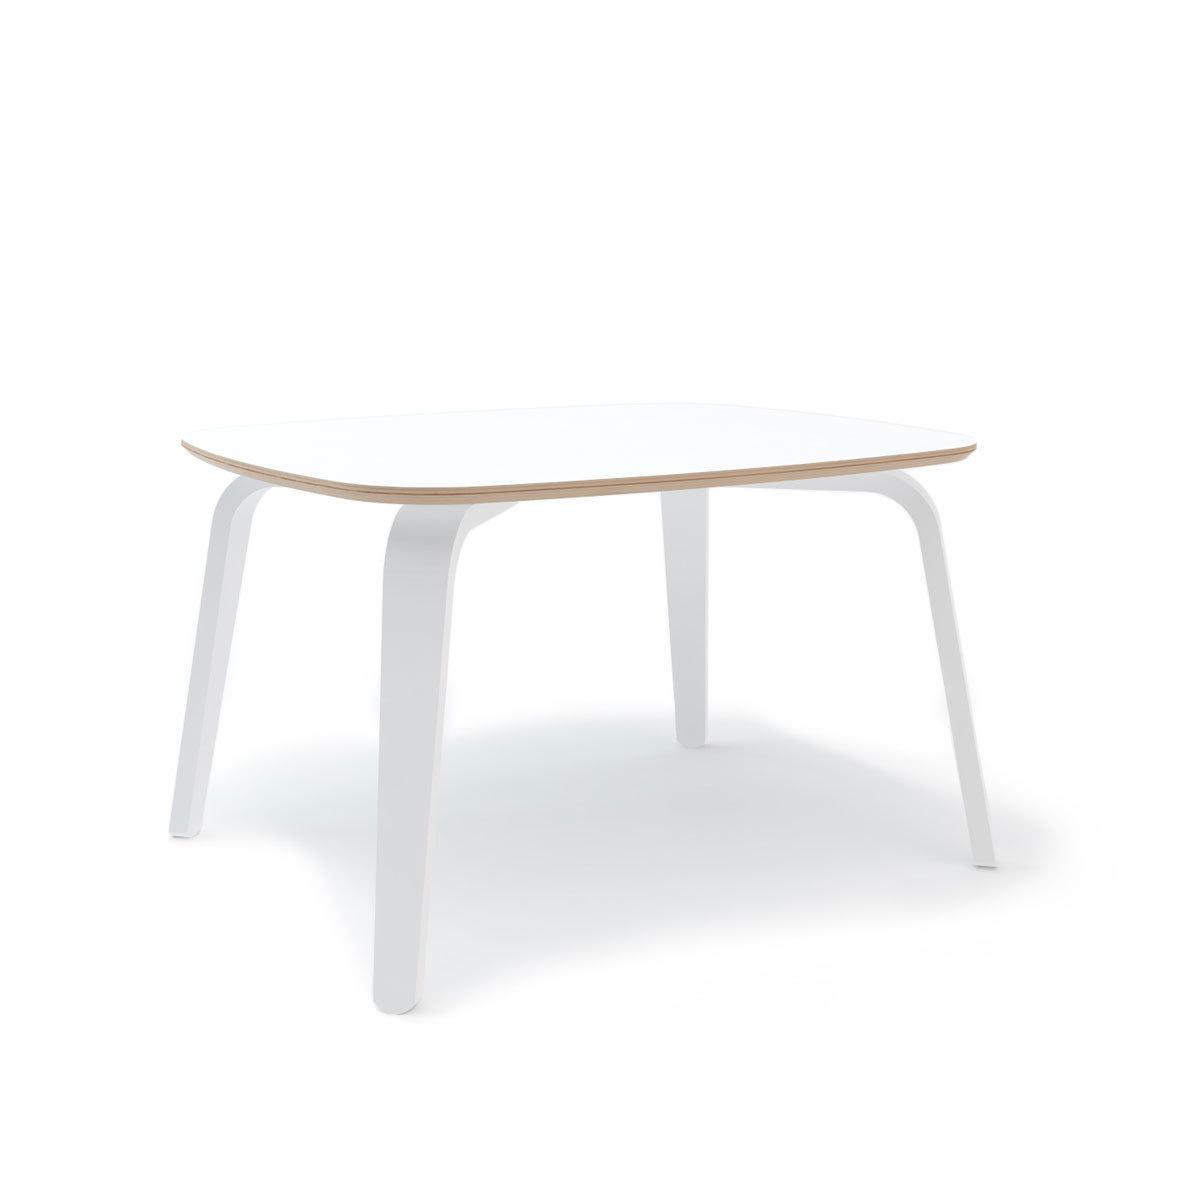 Table & Chaise Table Play - Blanc Table Play - Blanc